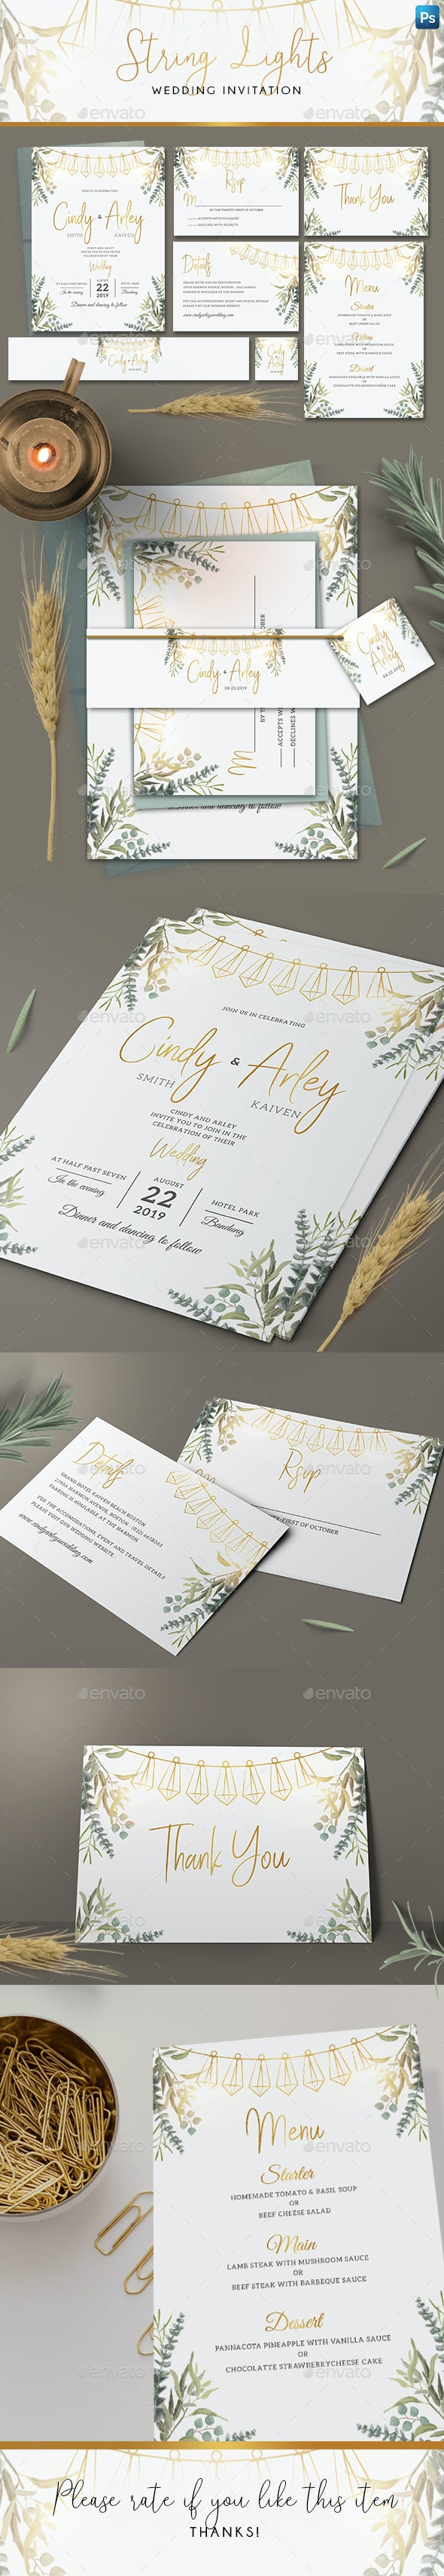 String Lights Invitation Set - Weddings Cards & Invites